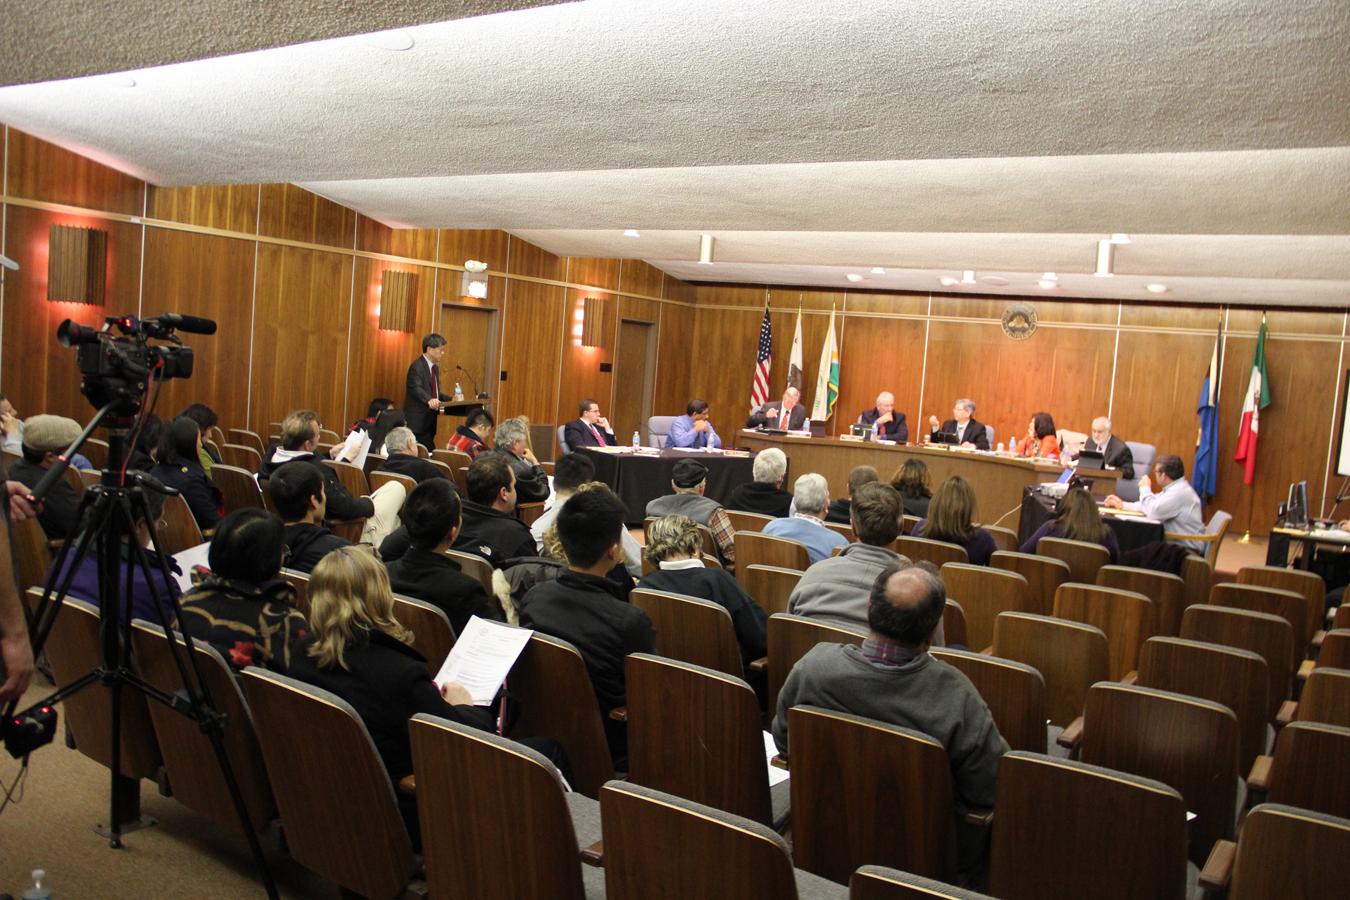 City Council Meeting Business Case